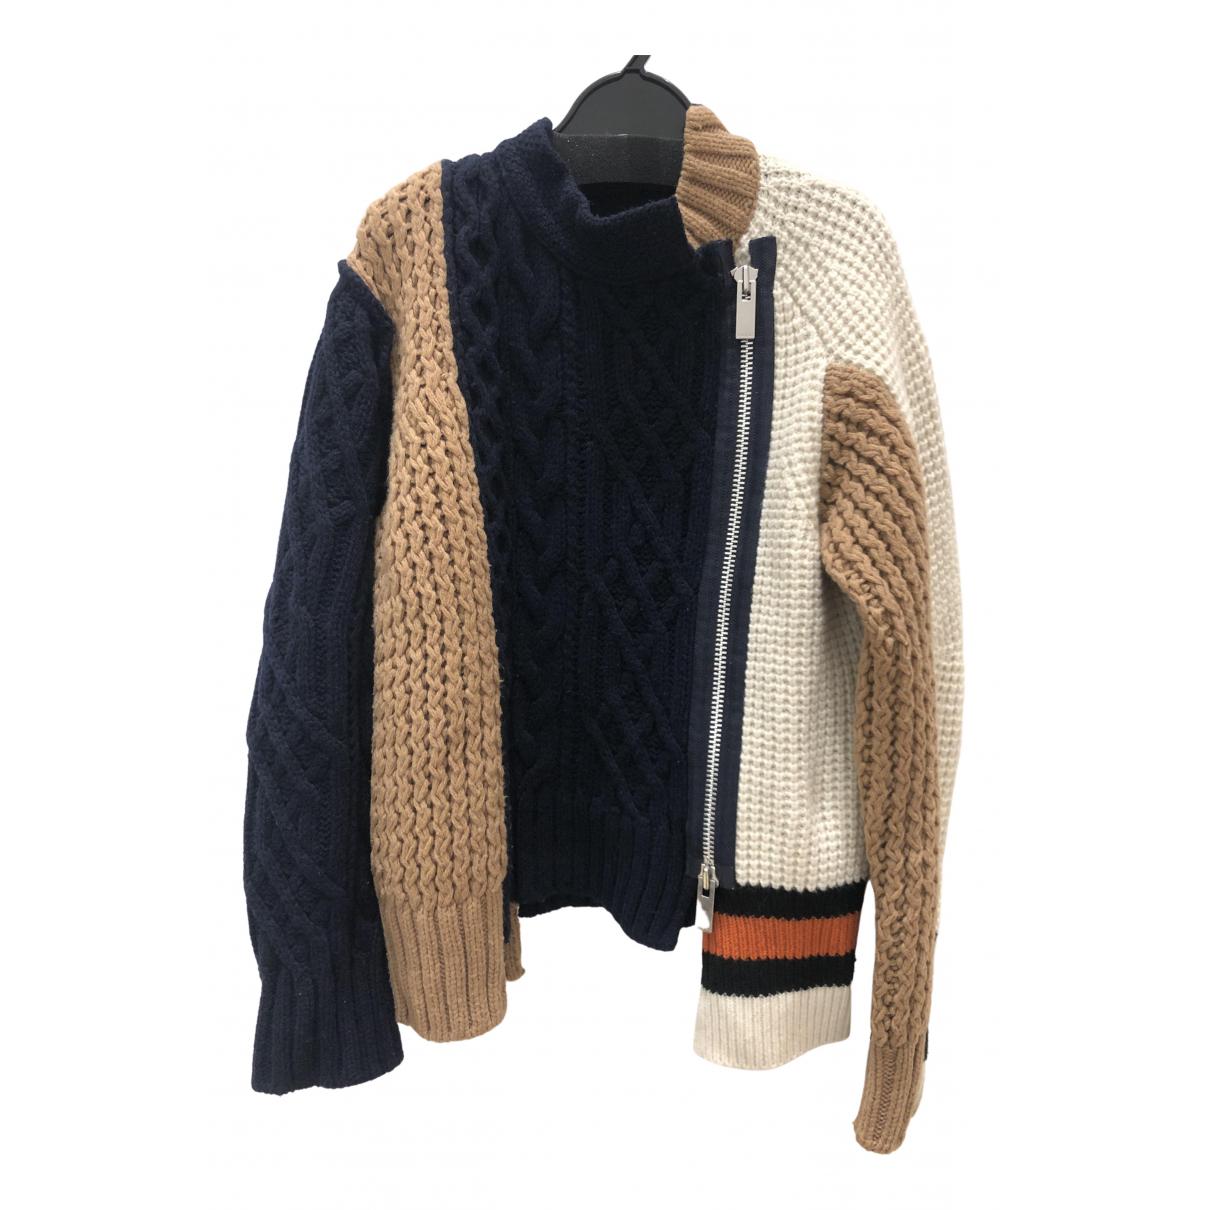 Sacai \N Multicolour Wool Knitwear for Women 1 0-5